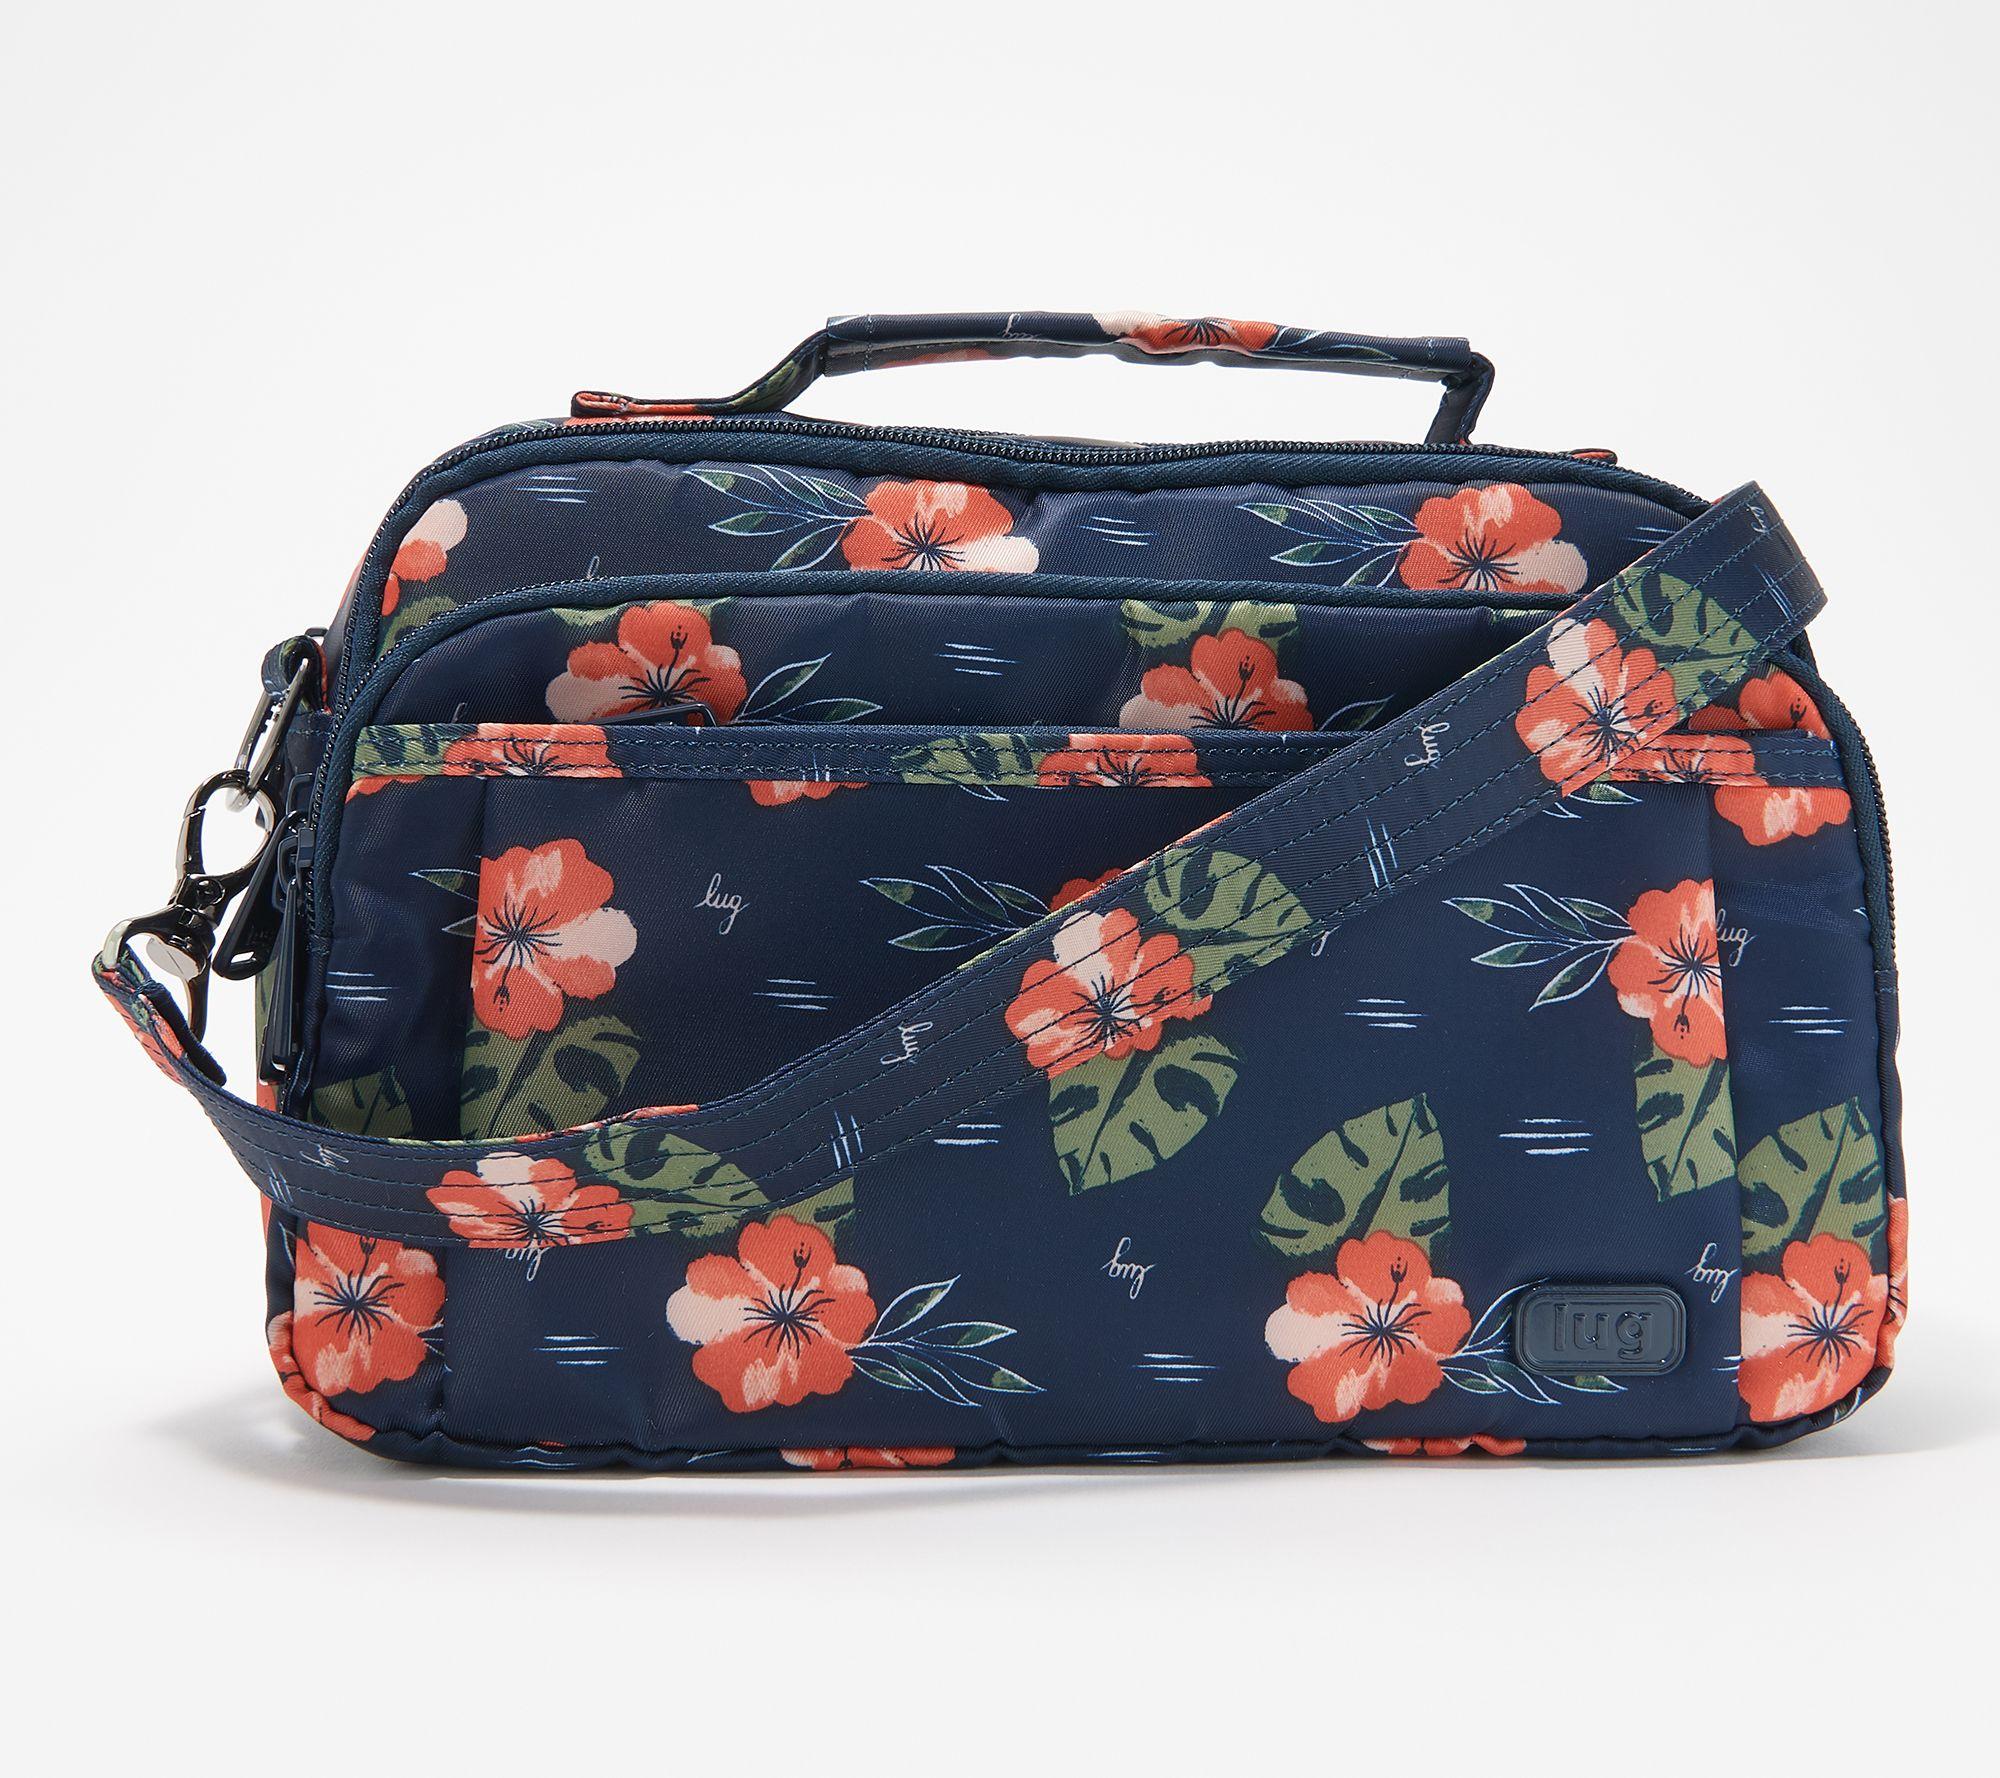 7ee5dd0d67198 Lug Top Handle Crossbody Bag - Scoop - Page 1 — QVC.com